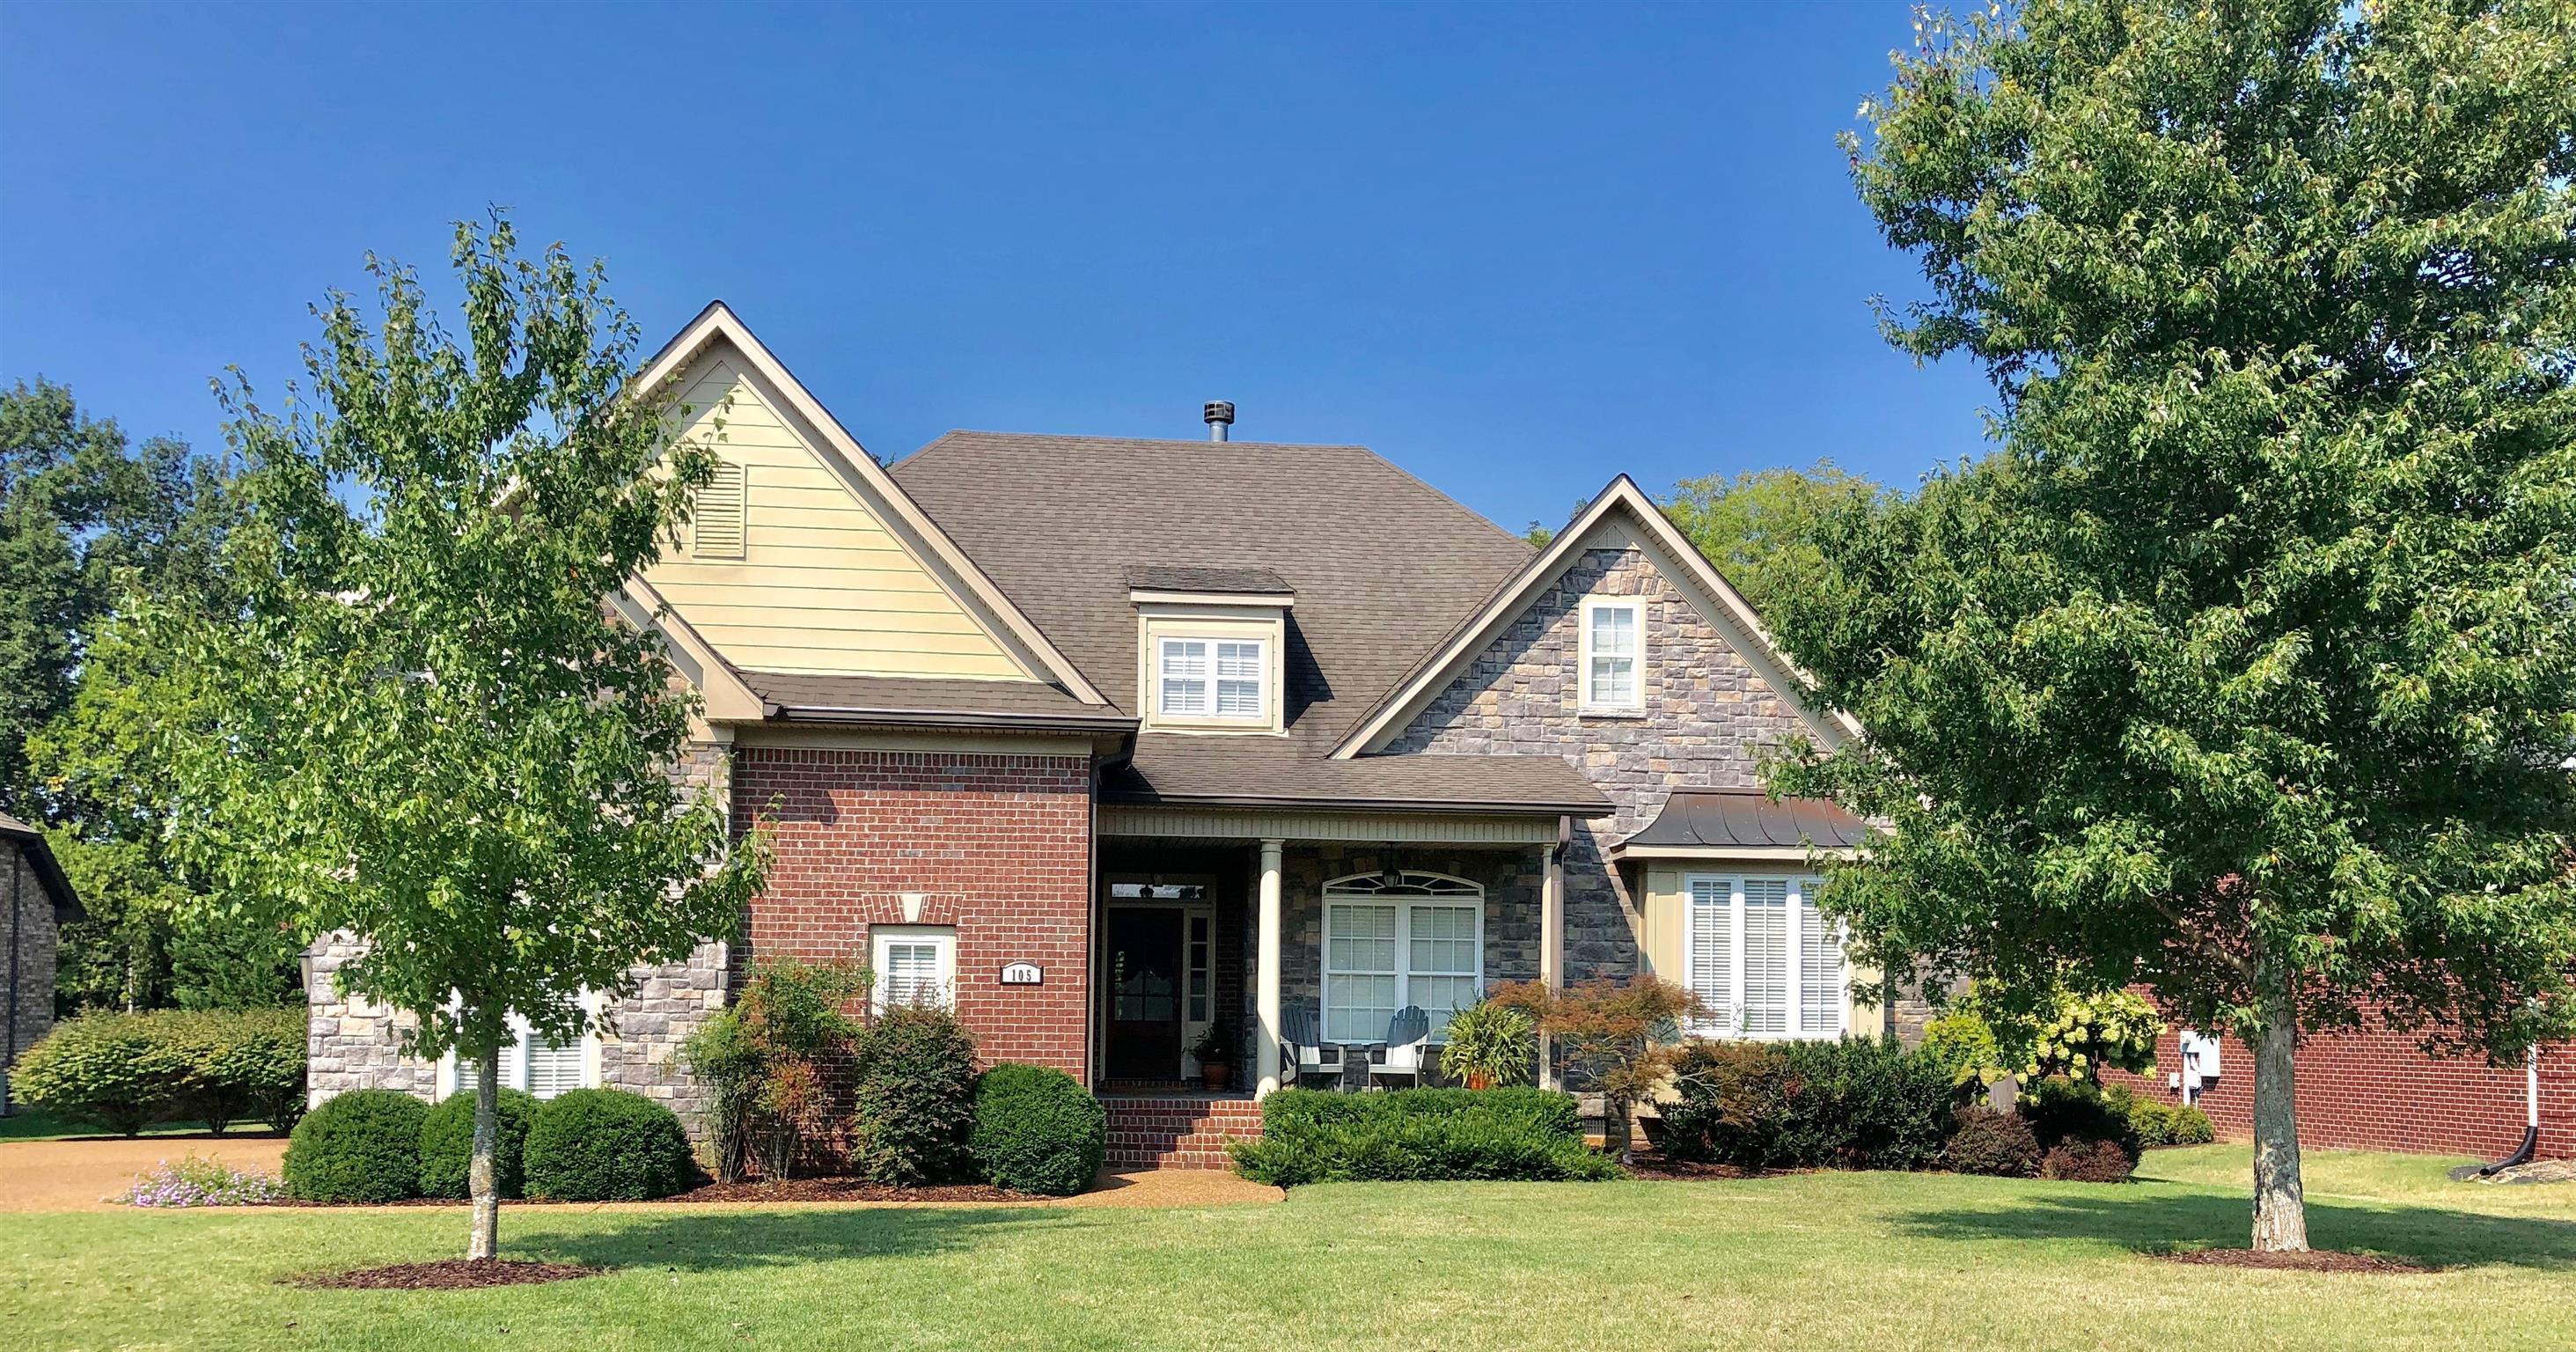 105 Frances King Dr, Smyrna, TN 37167 - Smyrna, TN real estate listing